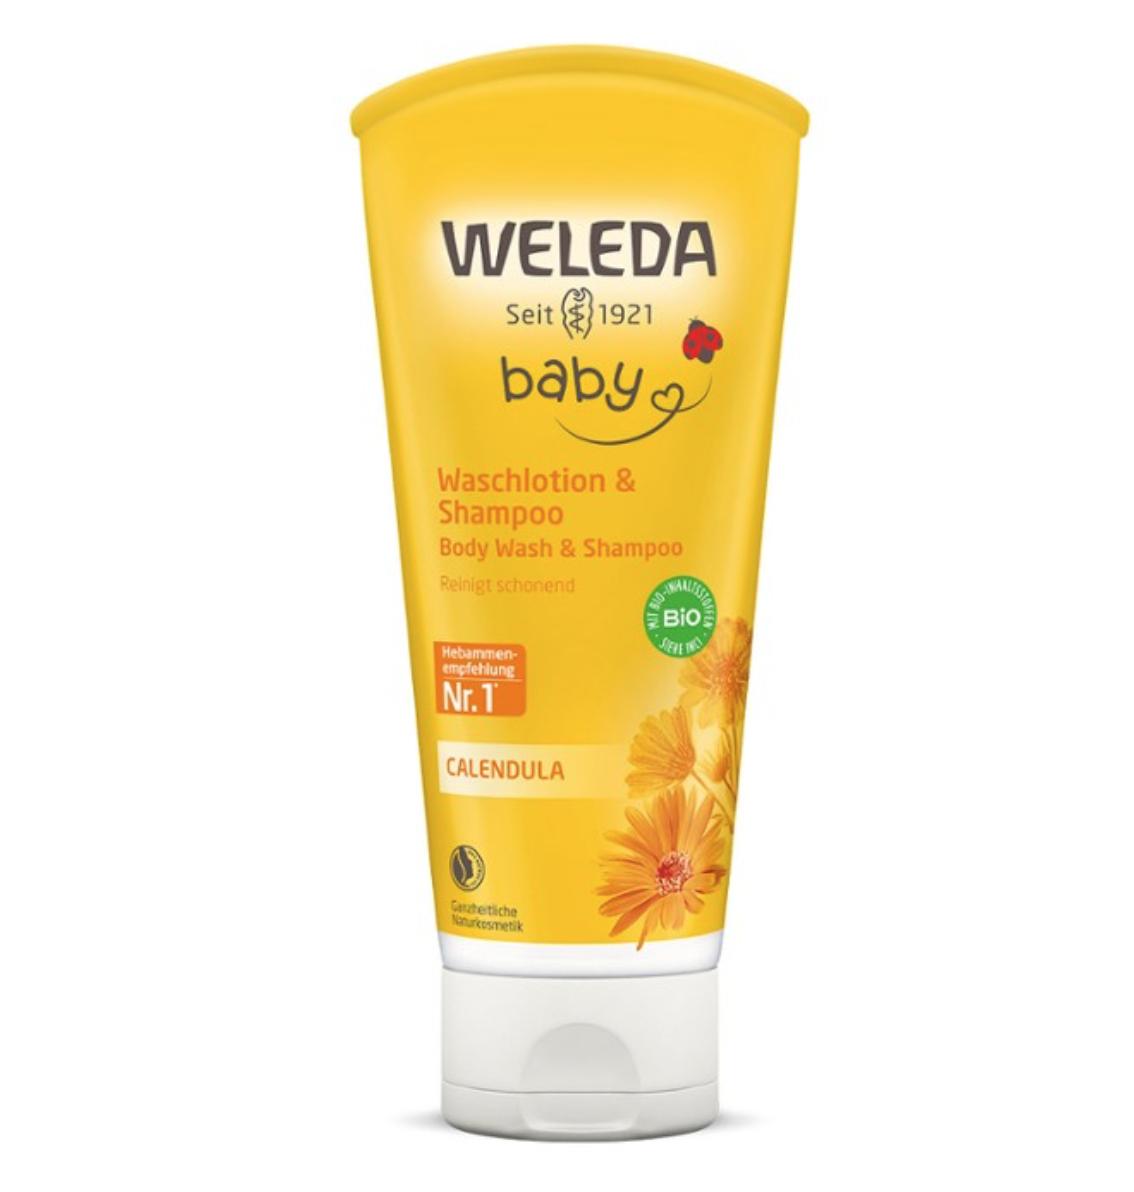 Baby Calendula Shampoo And Shower Gel 200 ml Weleda